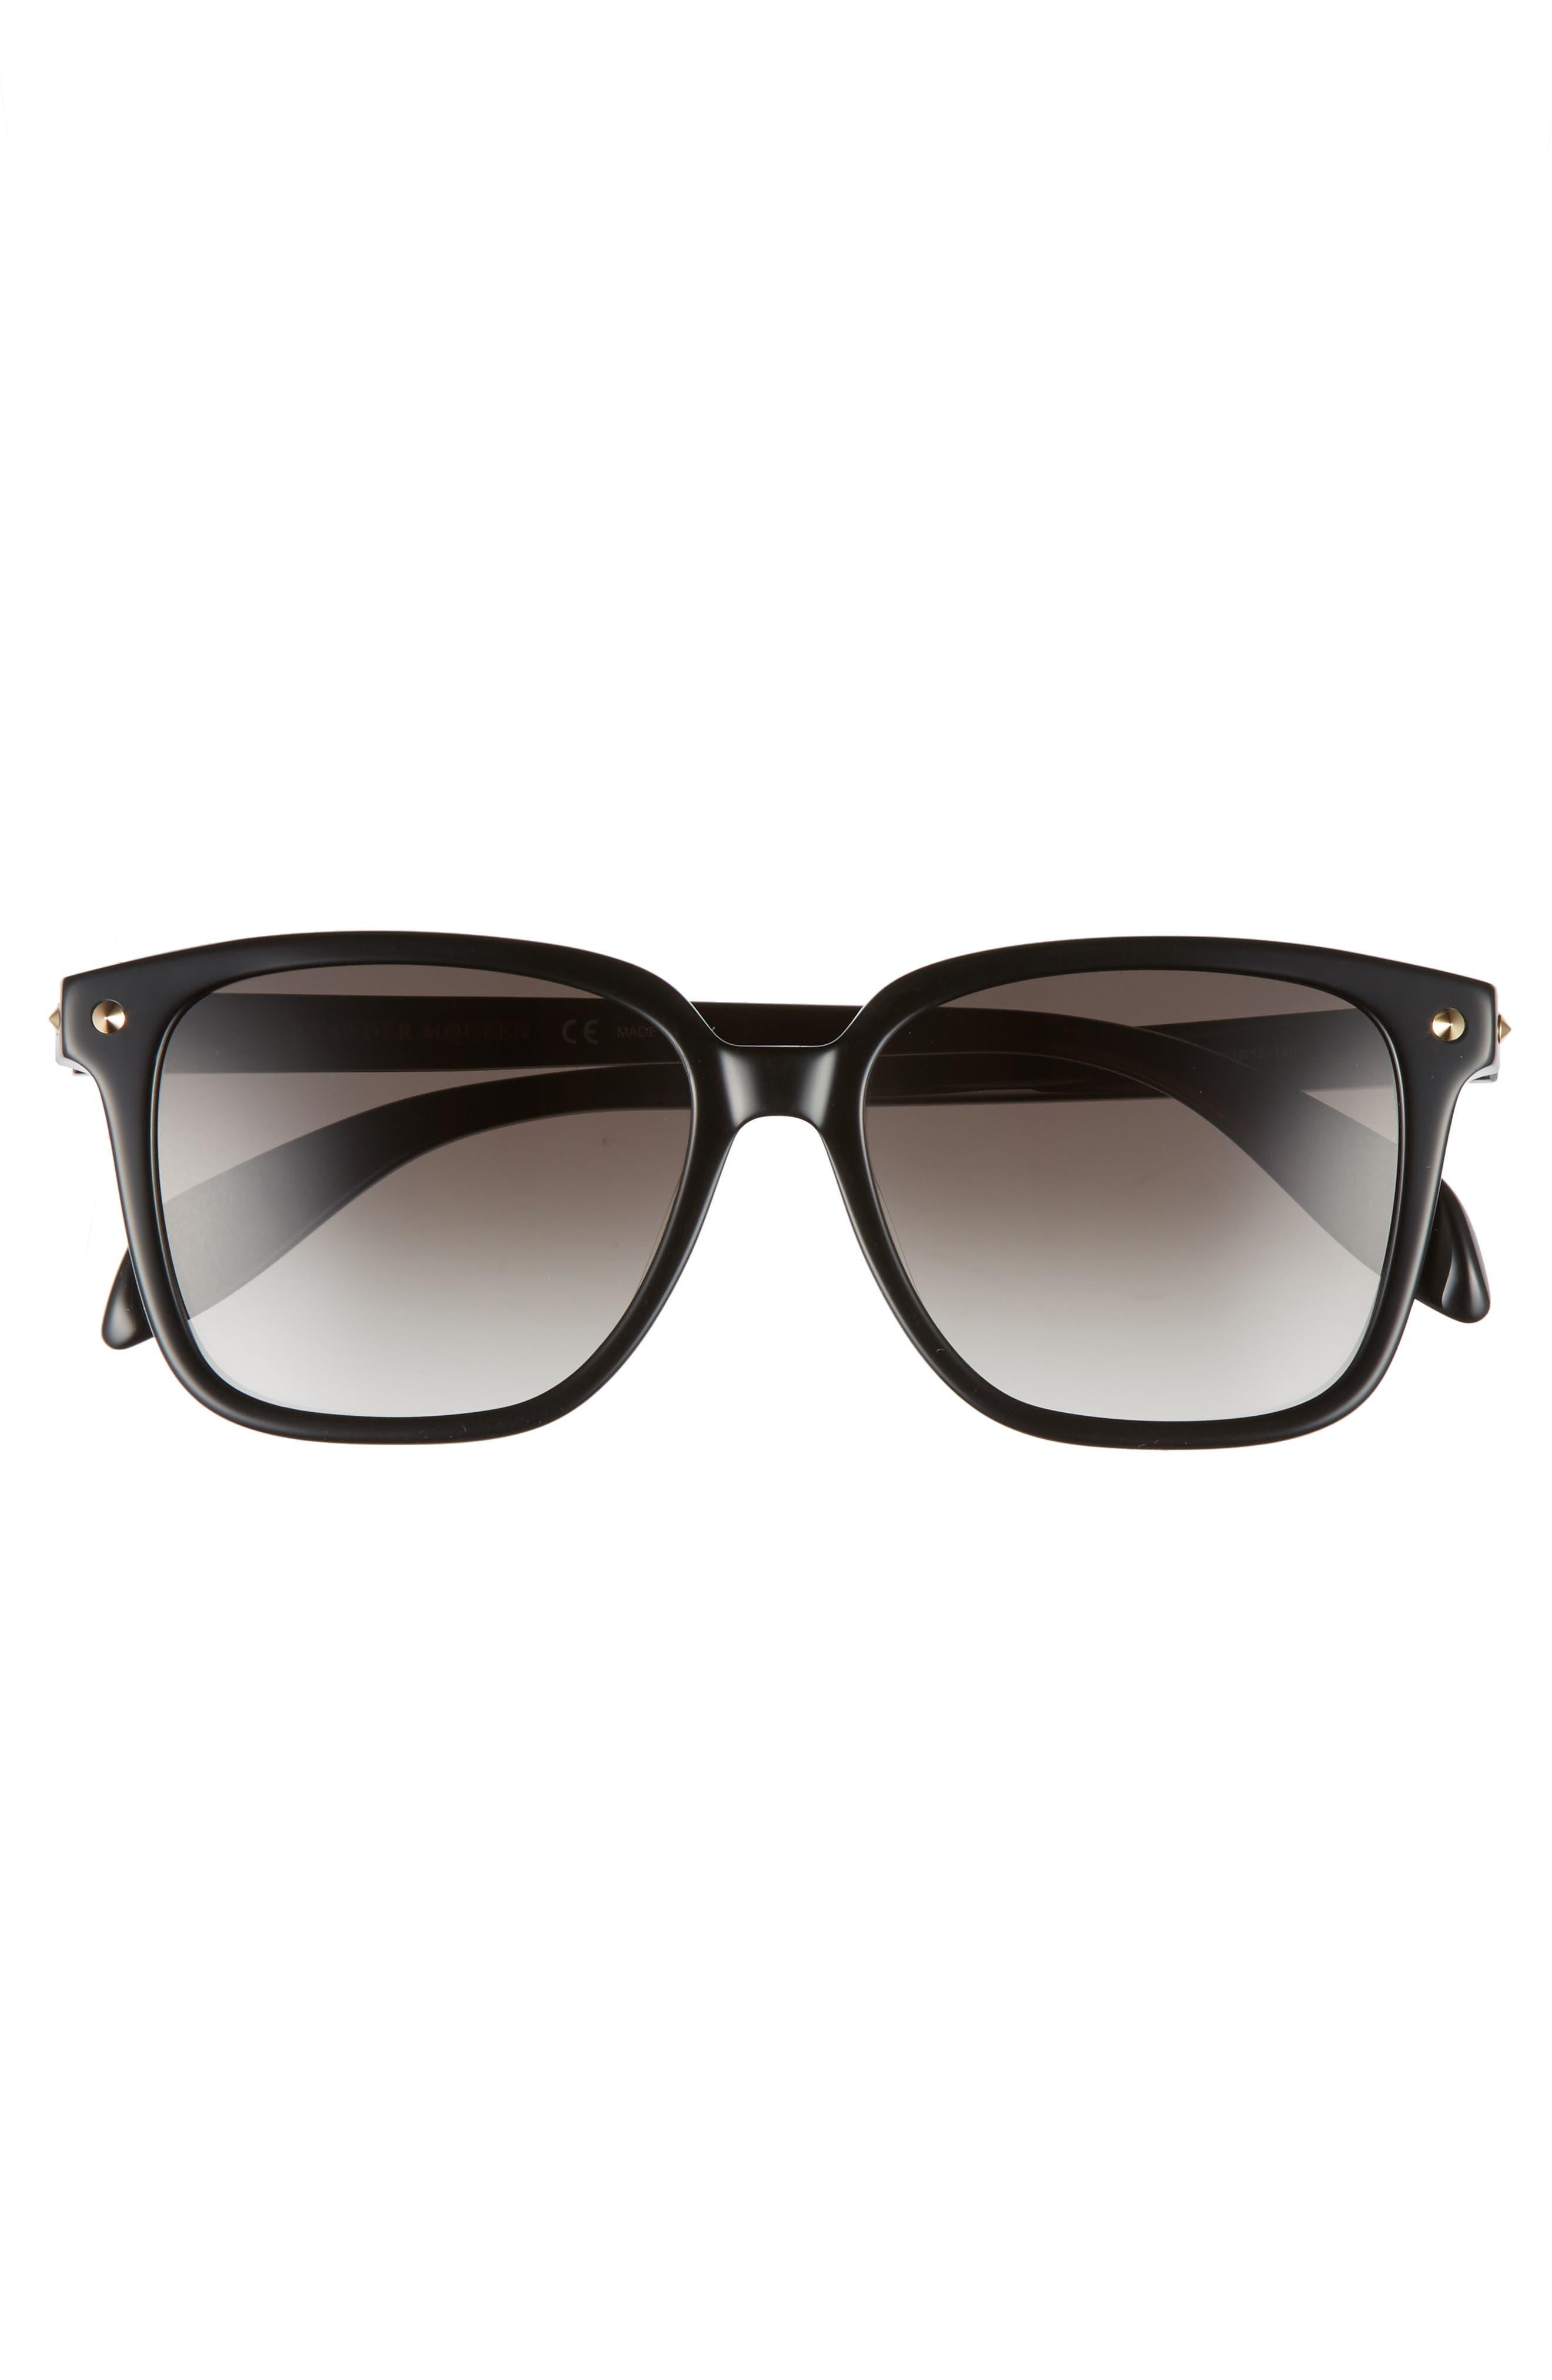 53mm Square Sunglasses,                             Alternate thumbnail 3, color,                             001